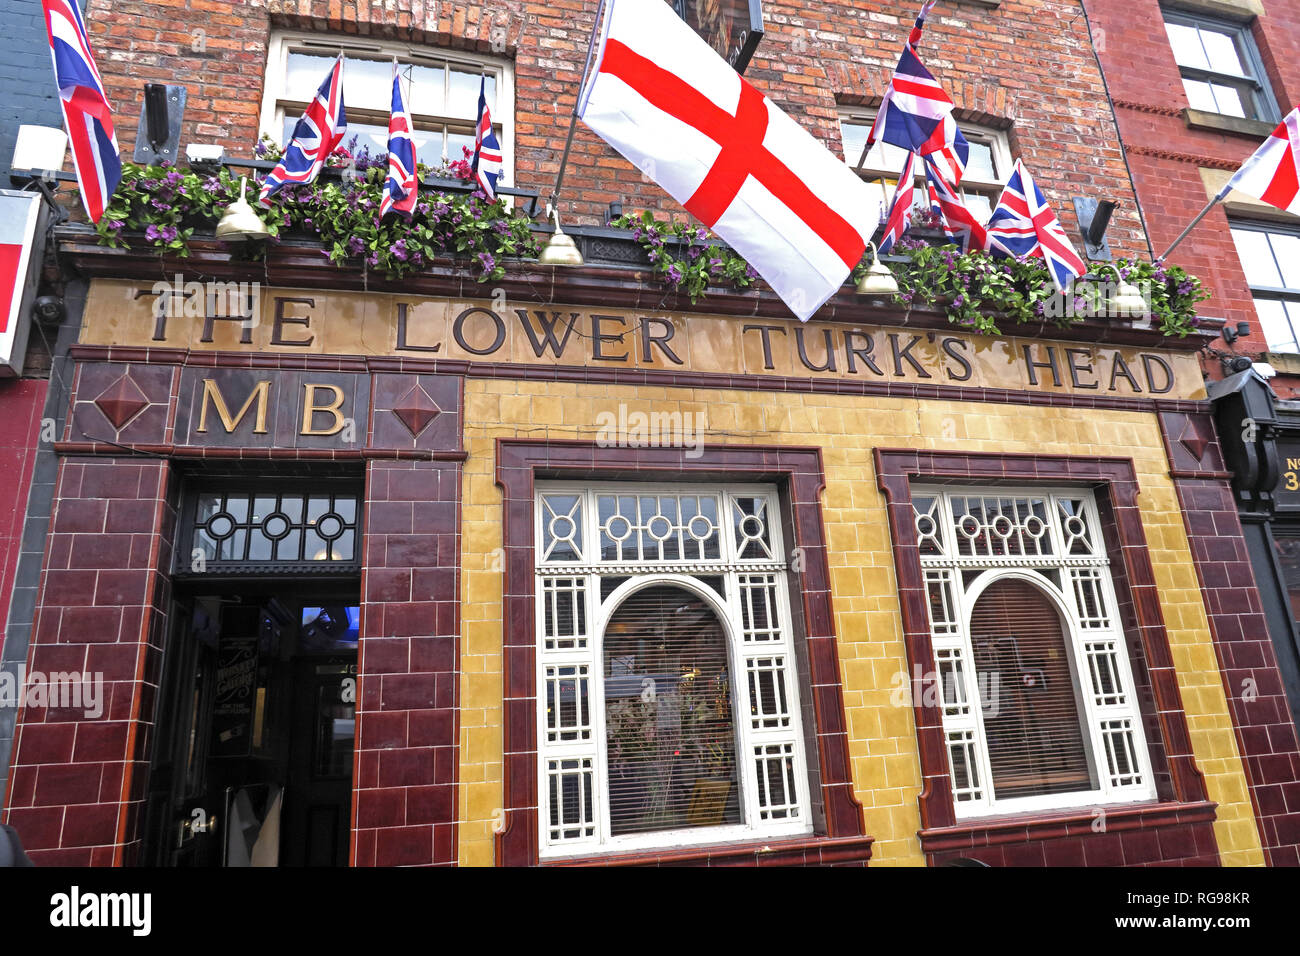 The Lower Turks Head, 36 Shudehill, Manchester, North West England, UK, M4 1EZ - Stock Image